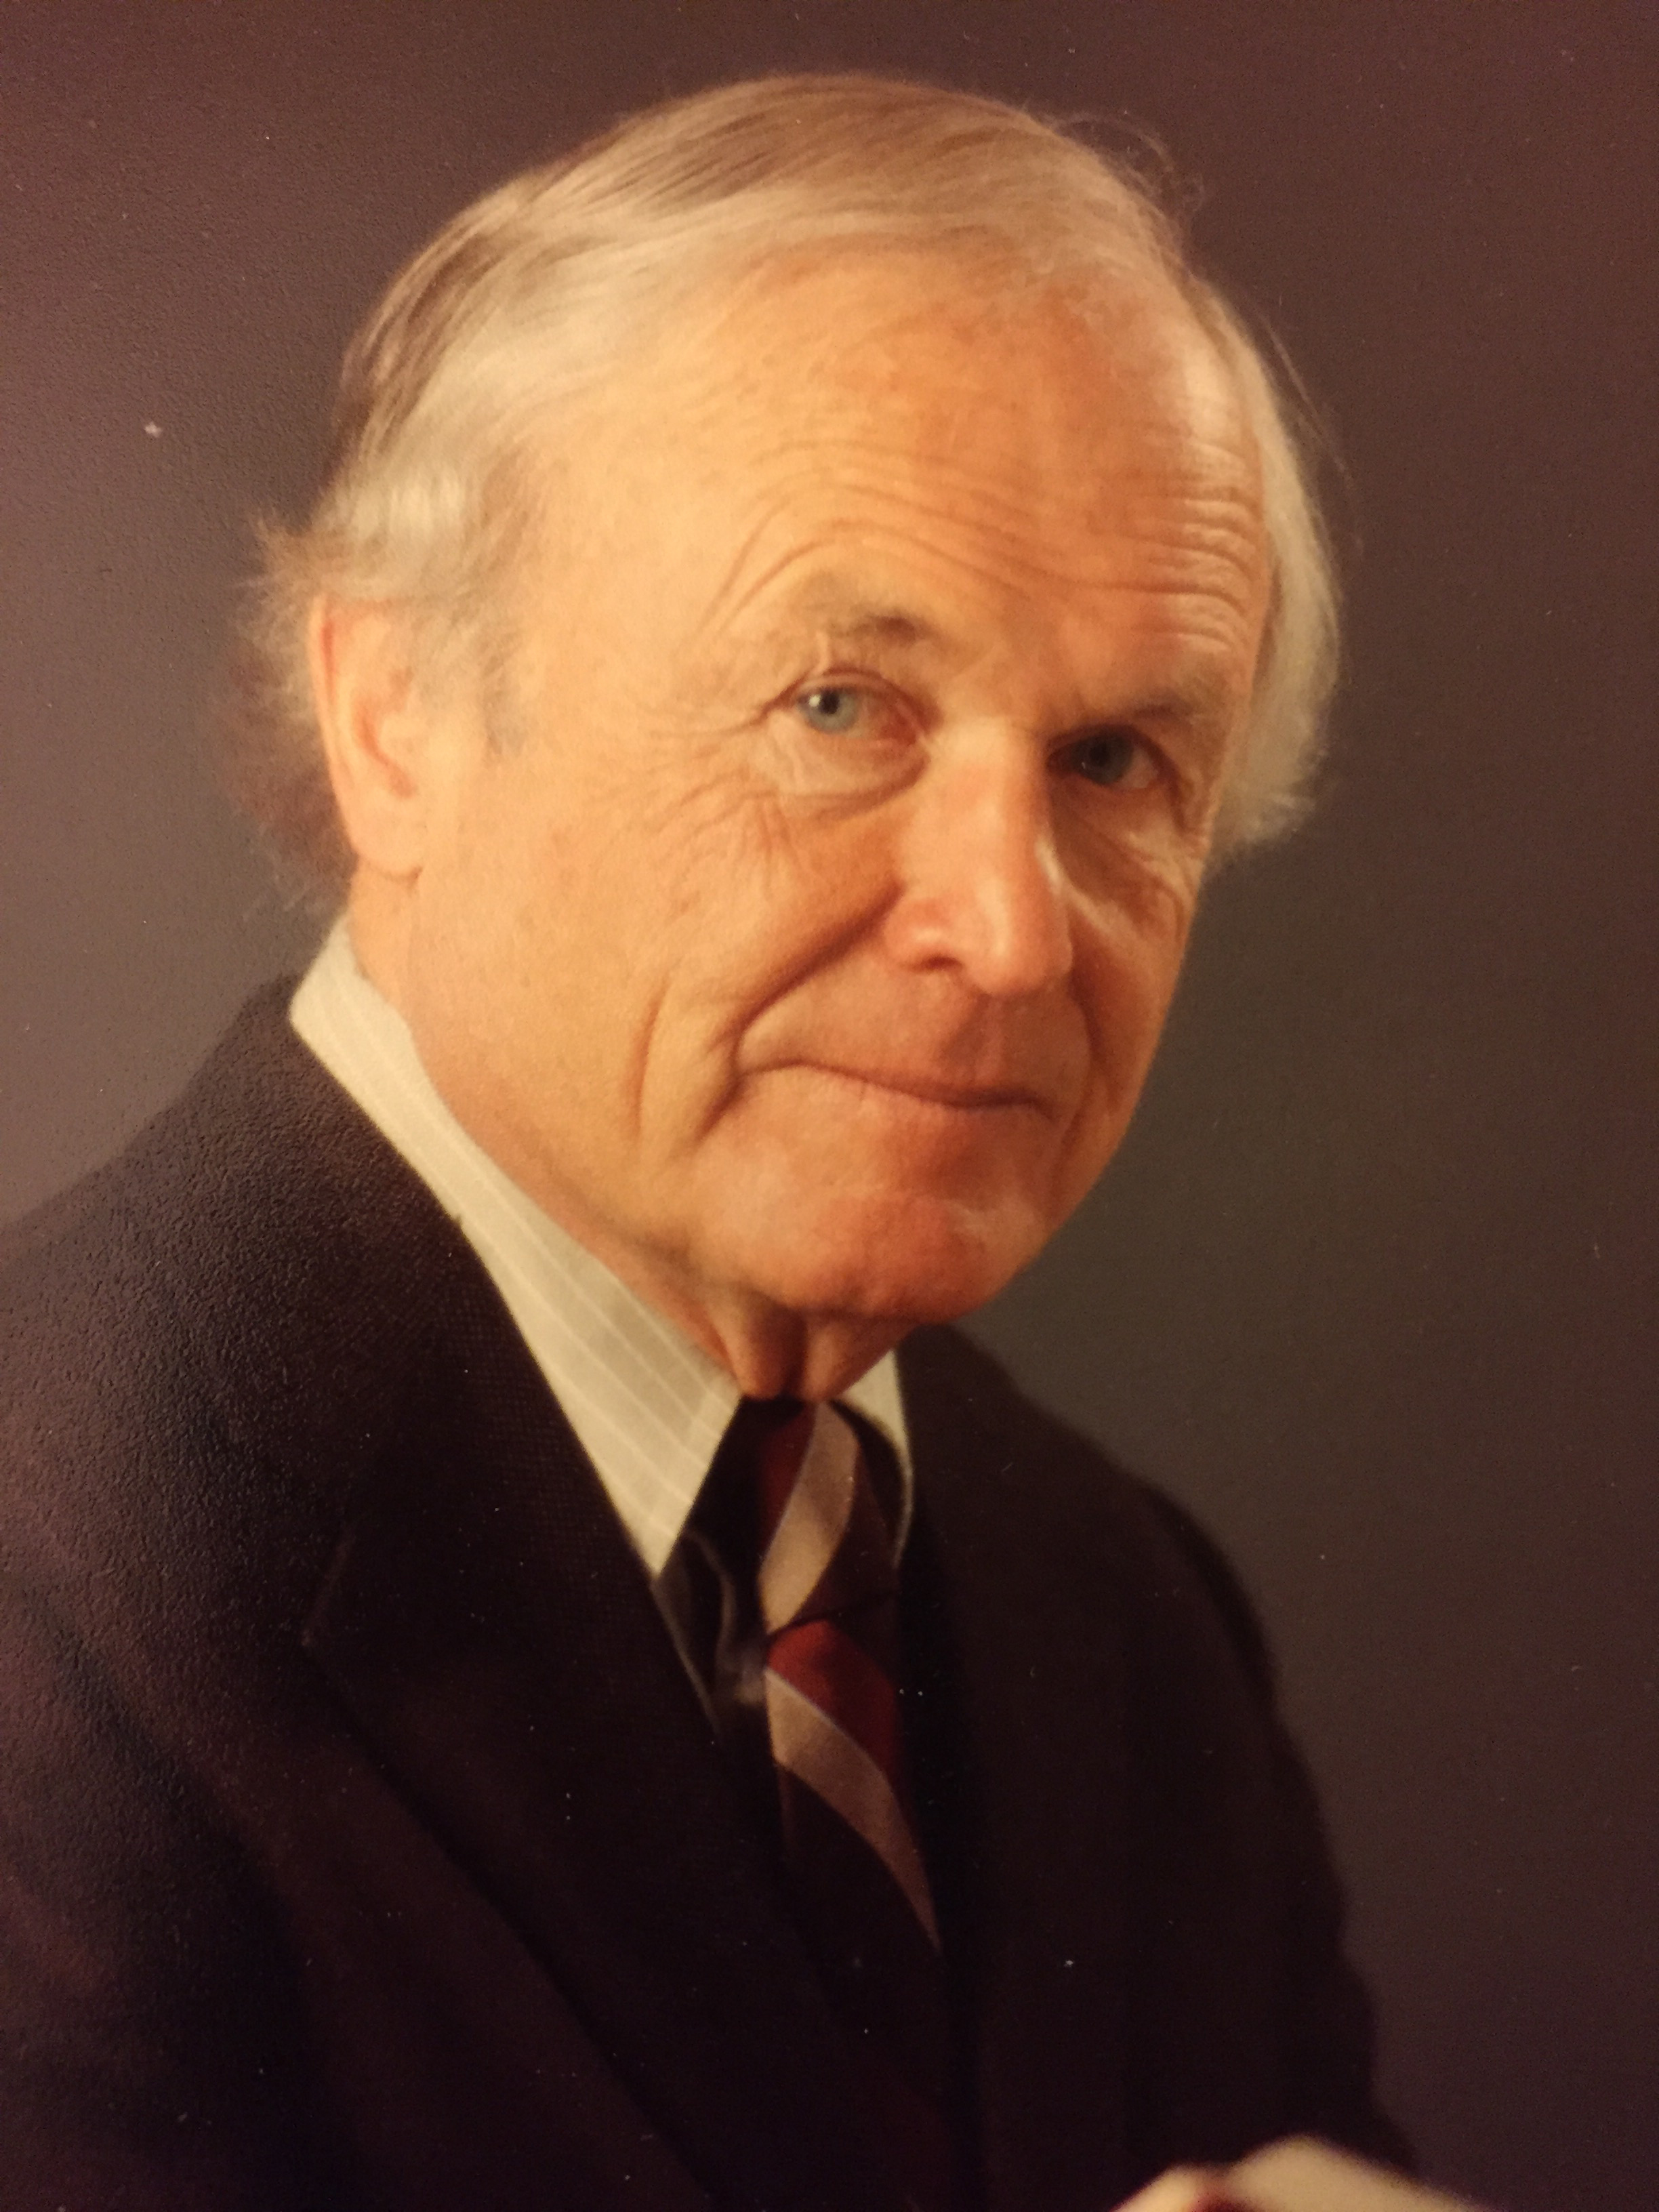 Honorable John T. Curtin